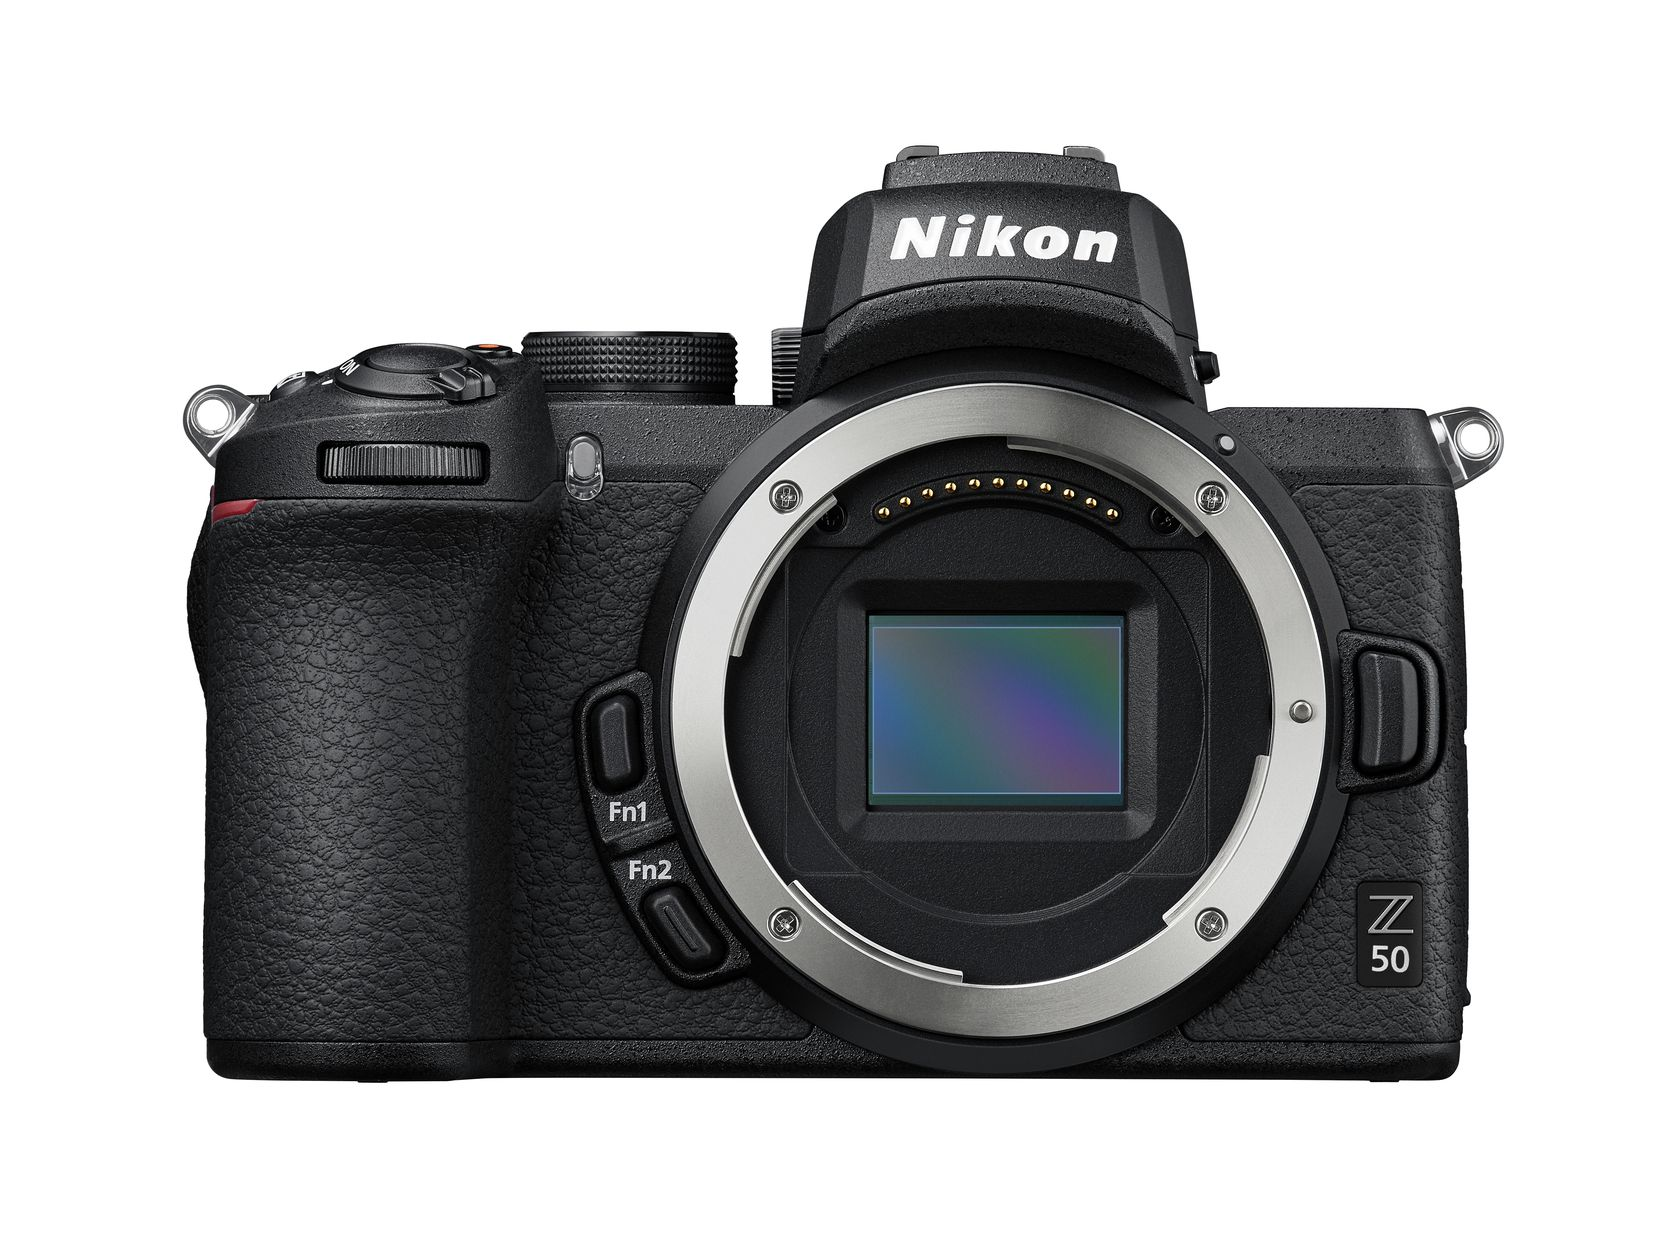 Nikon Z 50 body, showing the sensor and Z-mount.